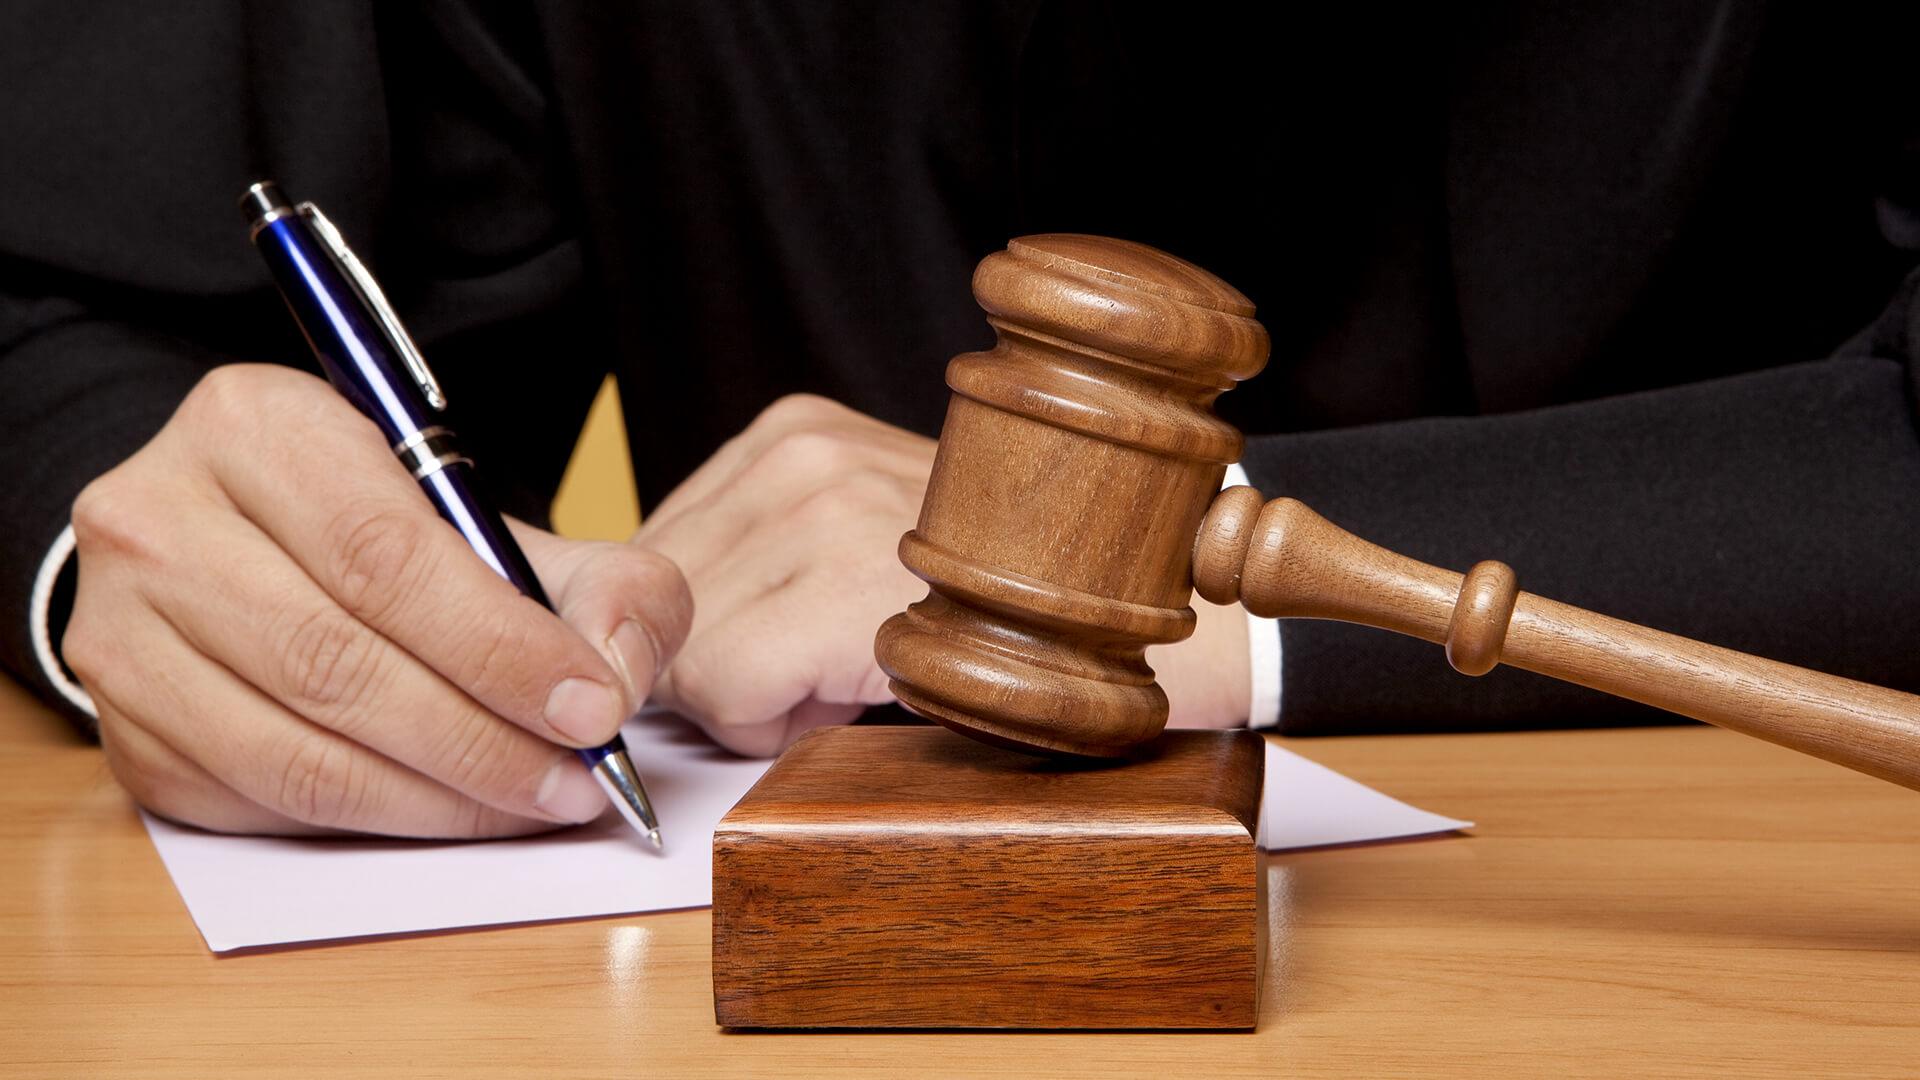 производство у мирового судьи реферат